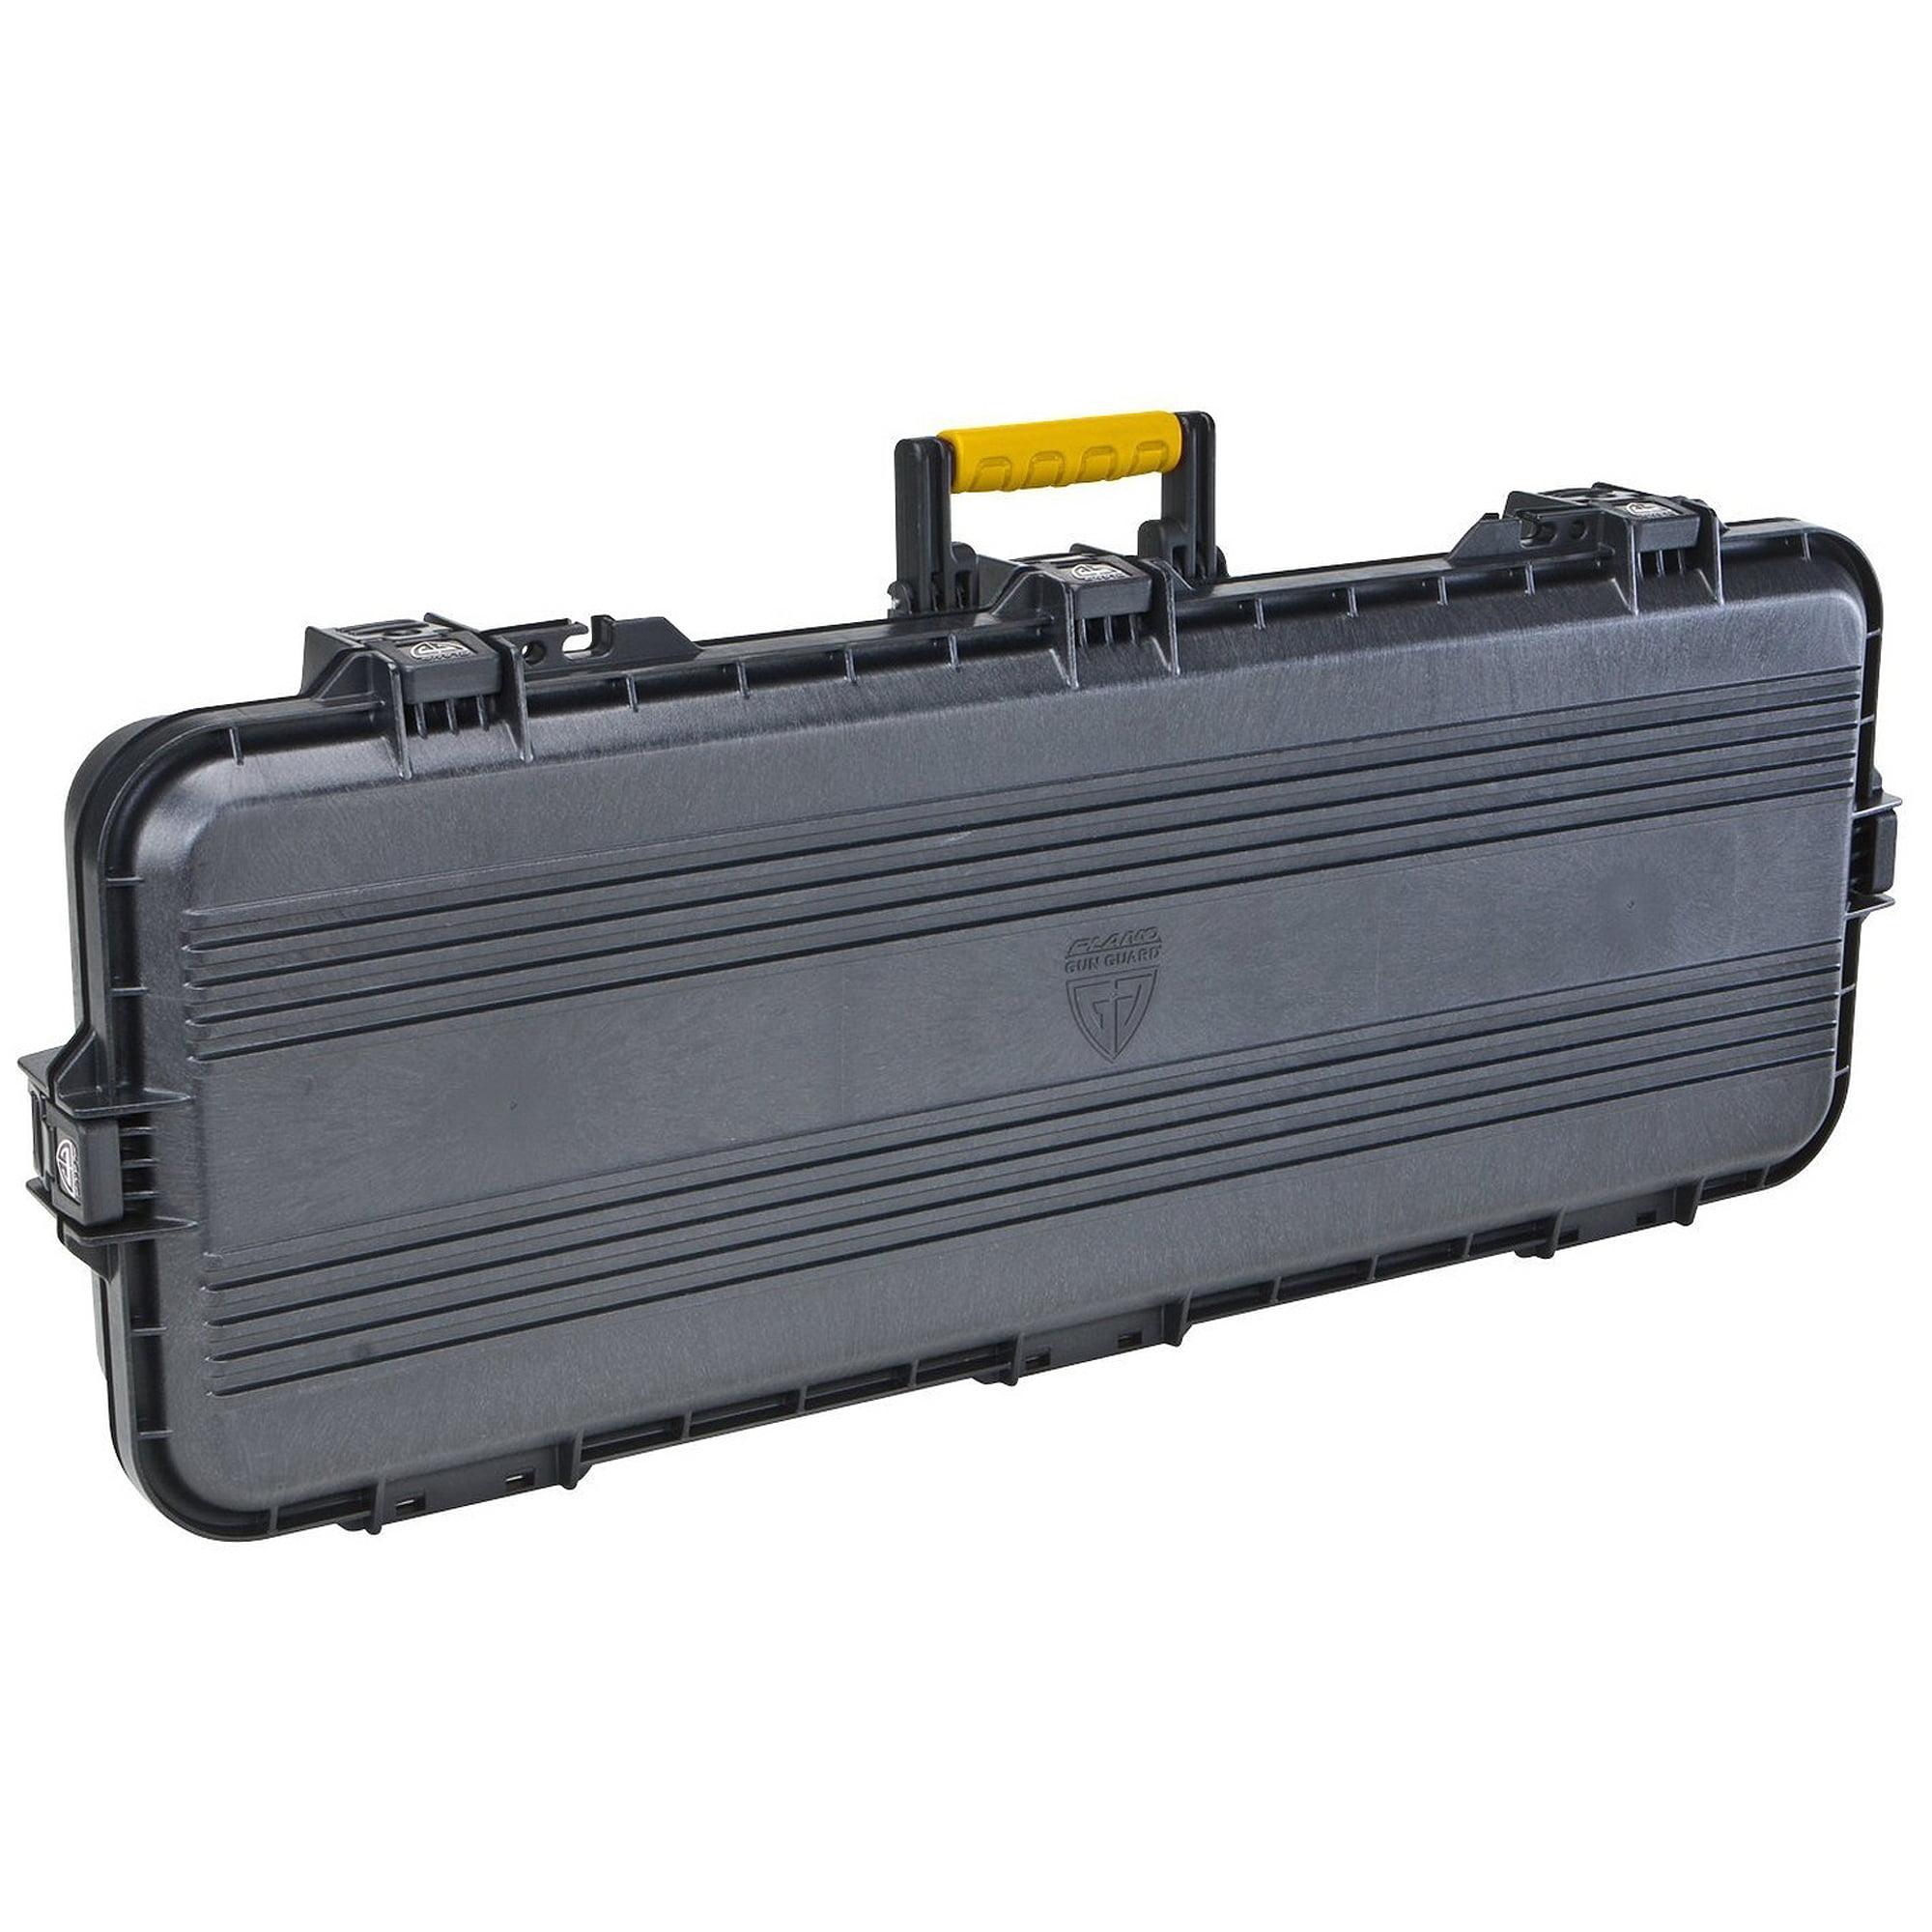 Tactical 1712 X2 Range Bag Walmartcom